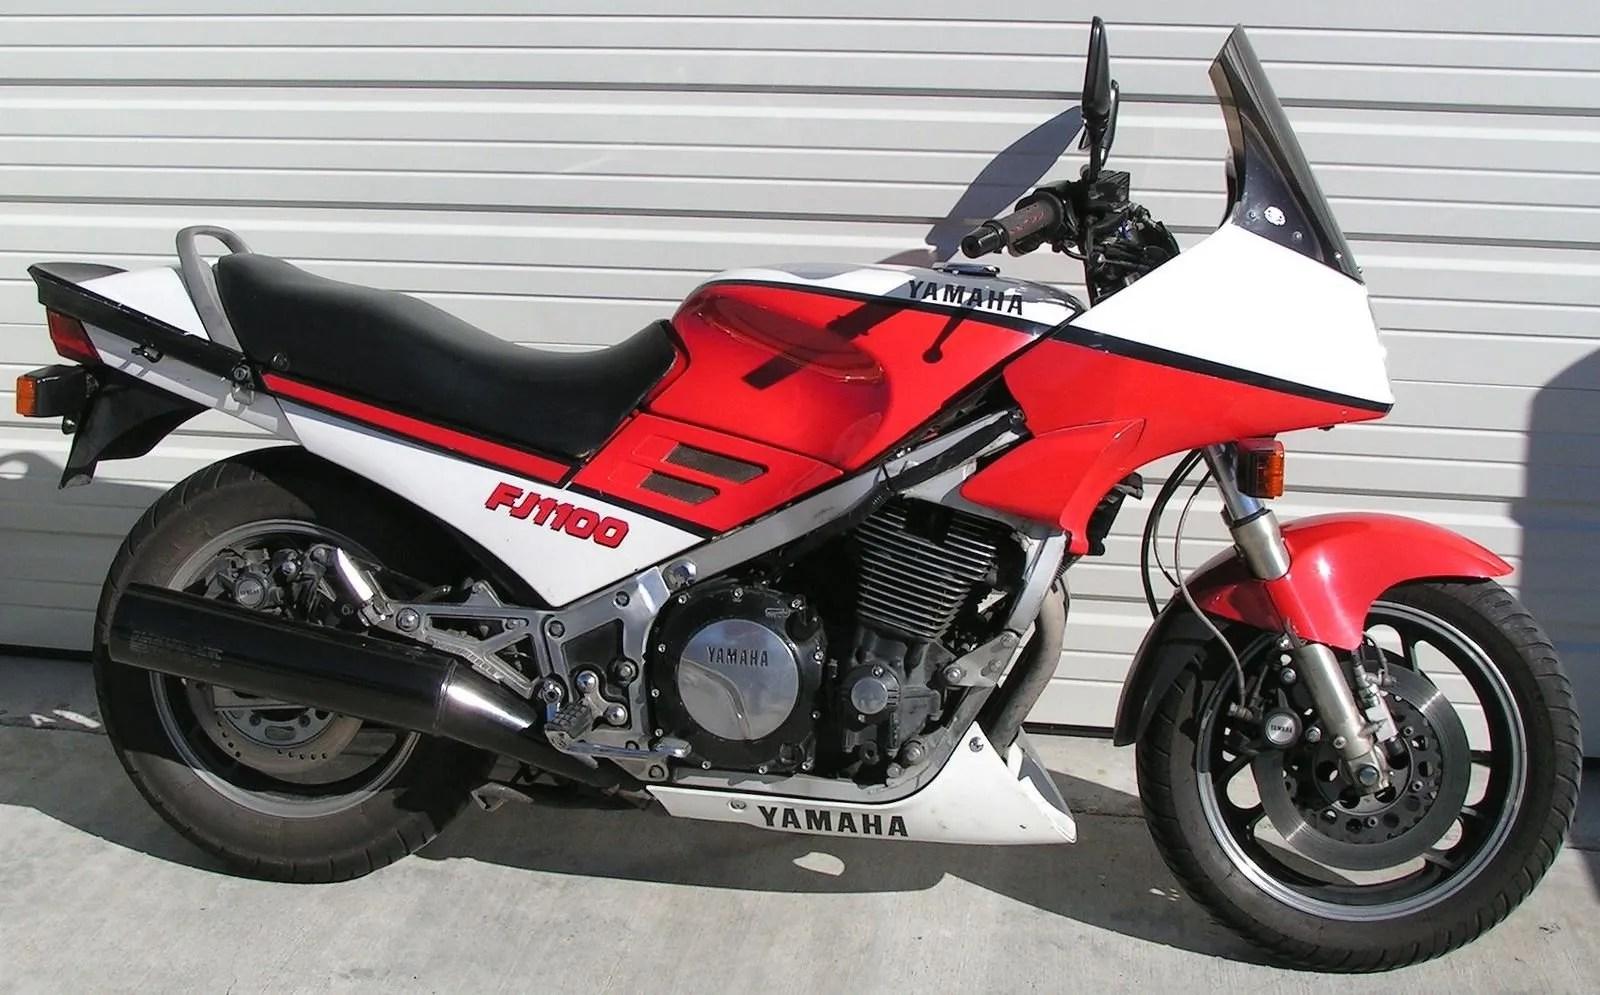 1986 1996 Yamaha FJ1100 And Yamaha FJ1200 Picture